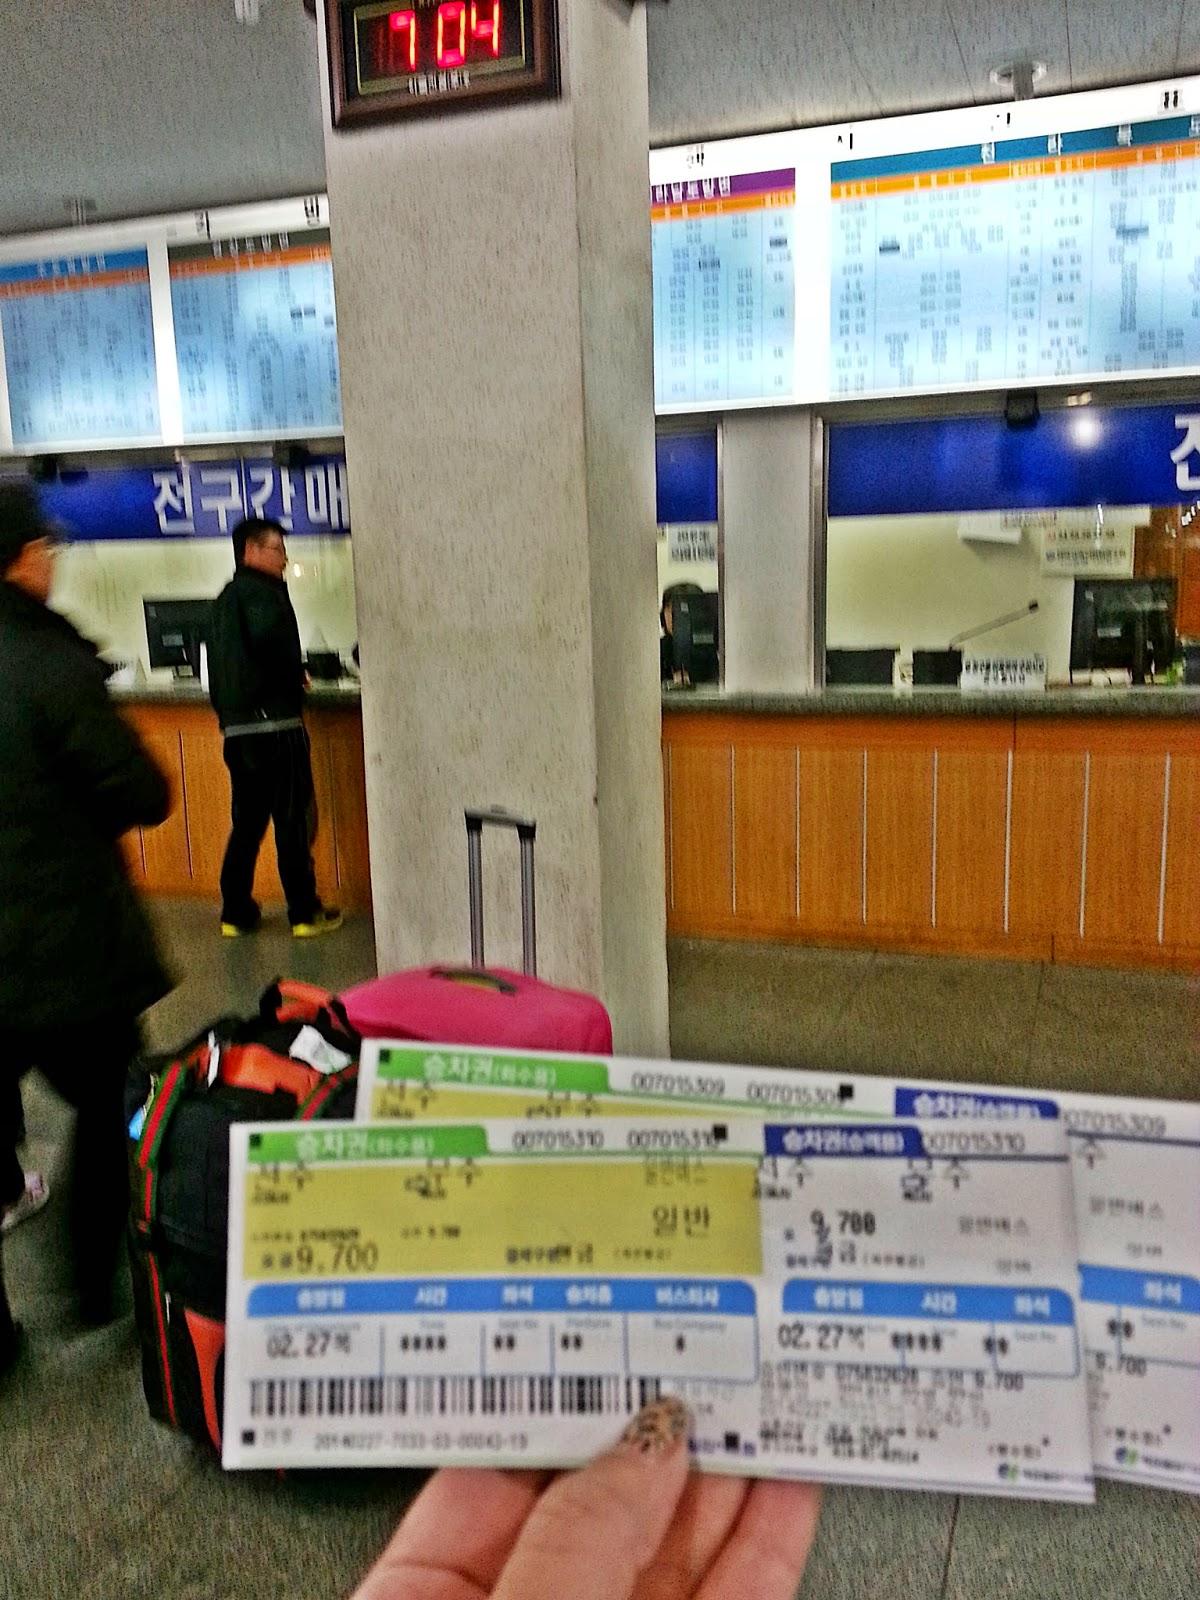 Jeonju Intercity Bus Terminal (전주시외버스터미널) | meheartseoul.blogspot.com